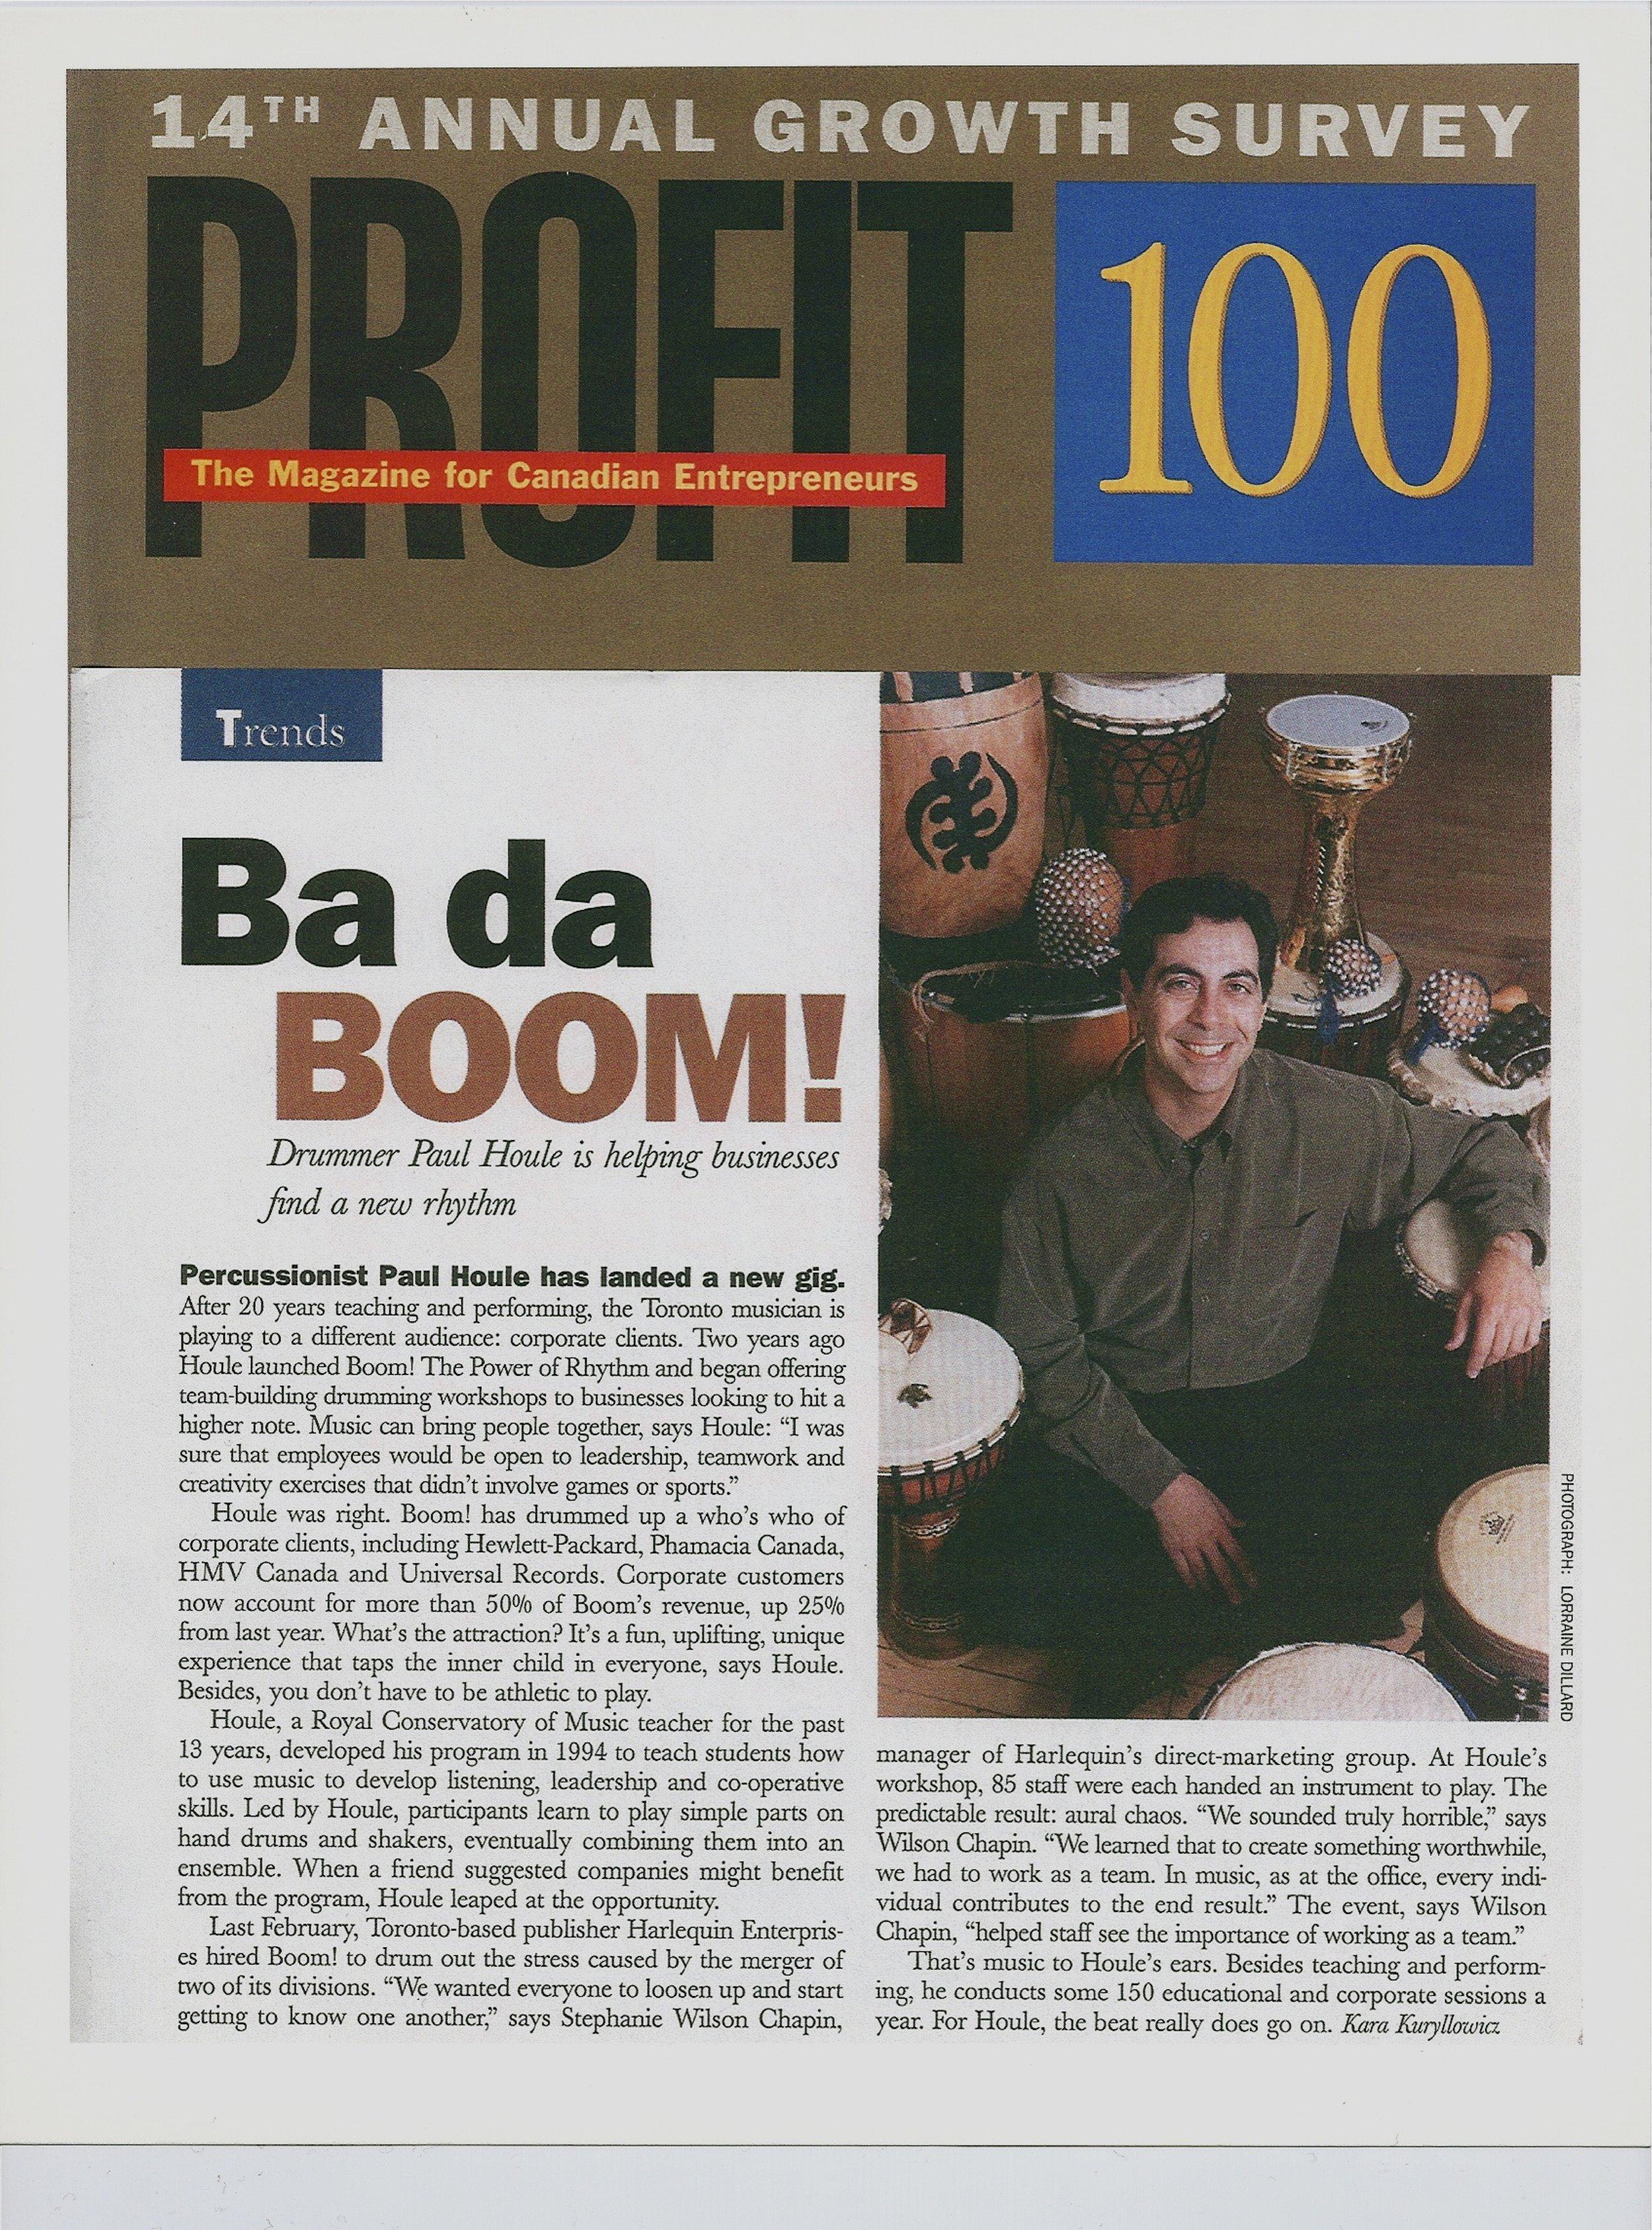 Boom! The Power of Rhythm - Paul Houle - Profit Magazine